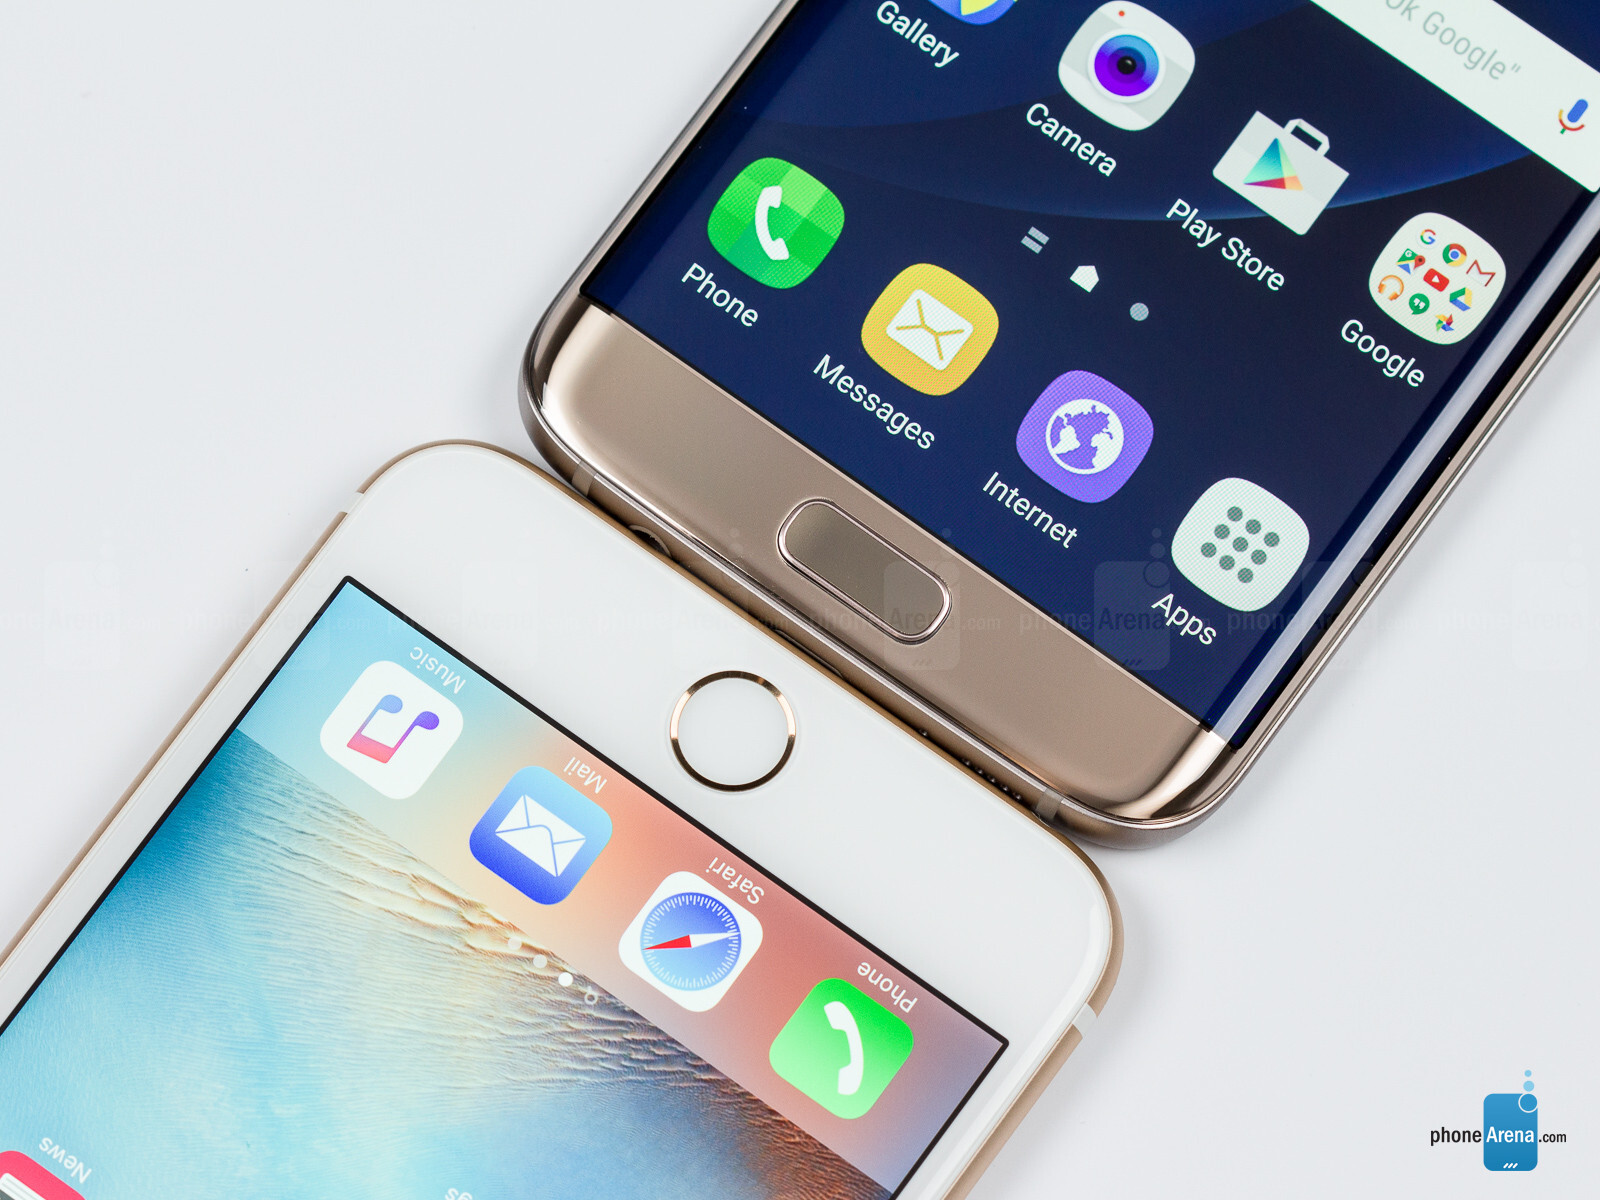 Samsung Galaxy S7 edge vs Apple iPhone 6s Plus - PhoneArena